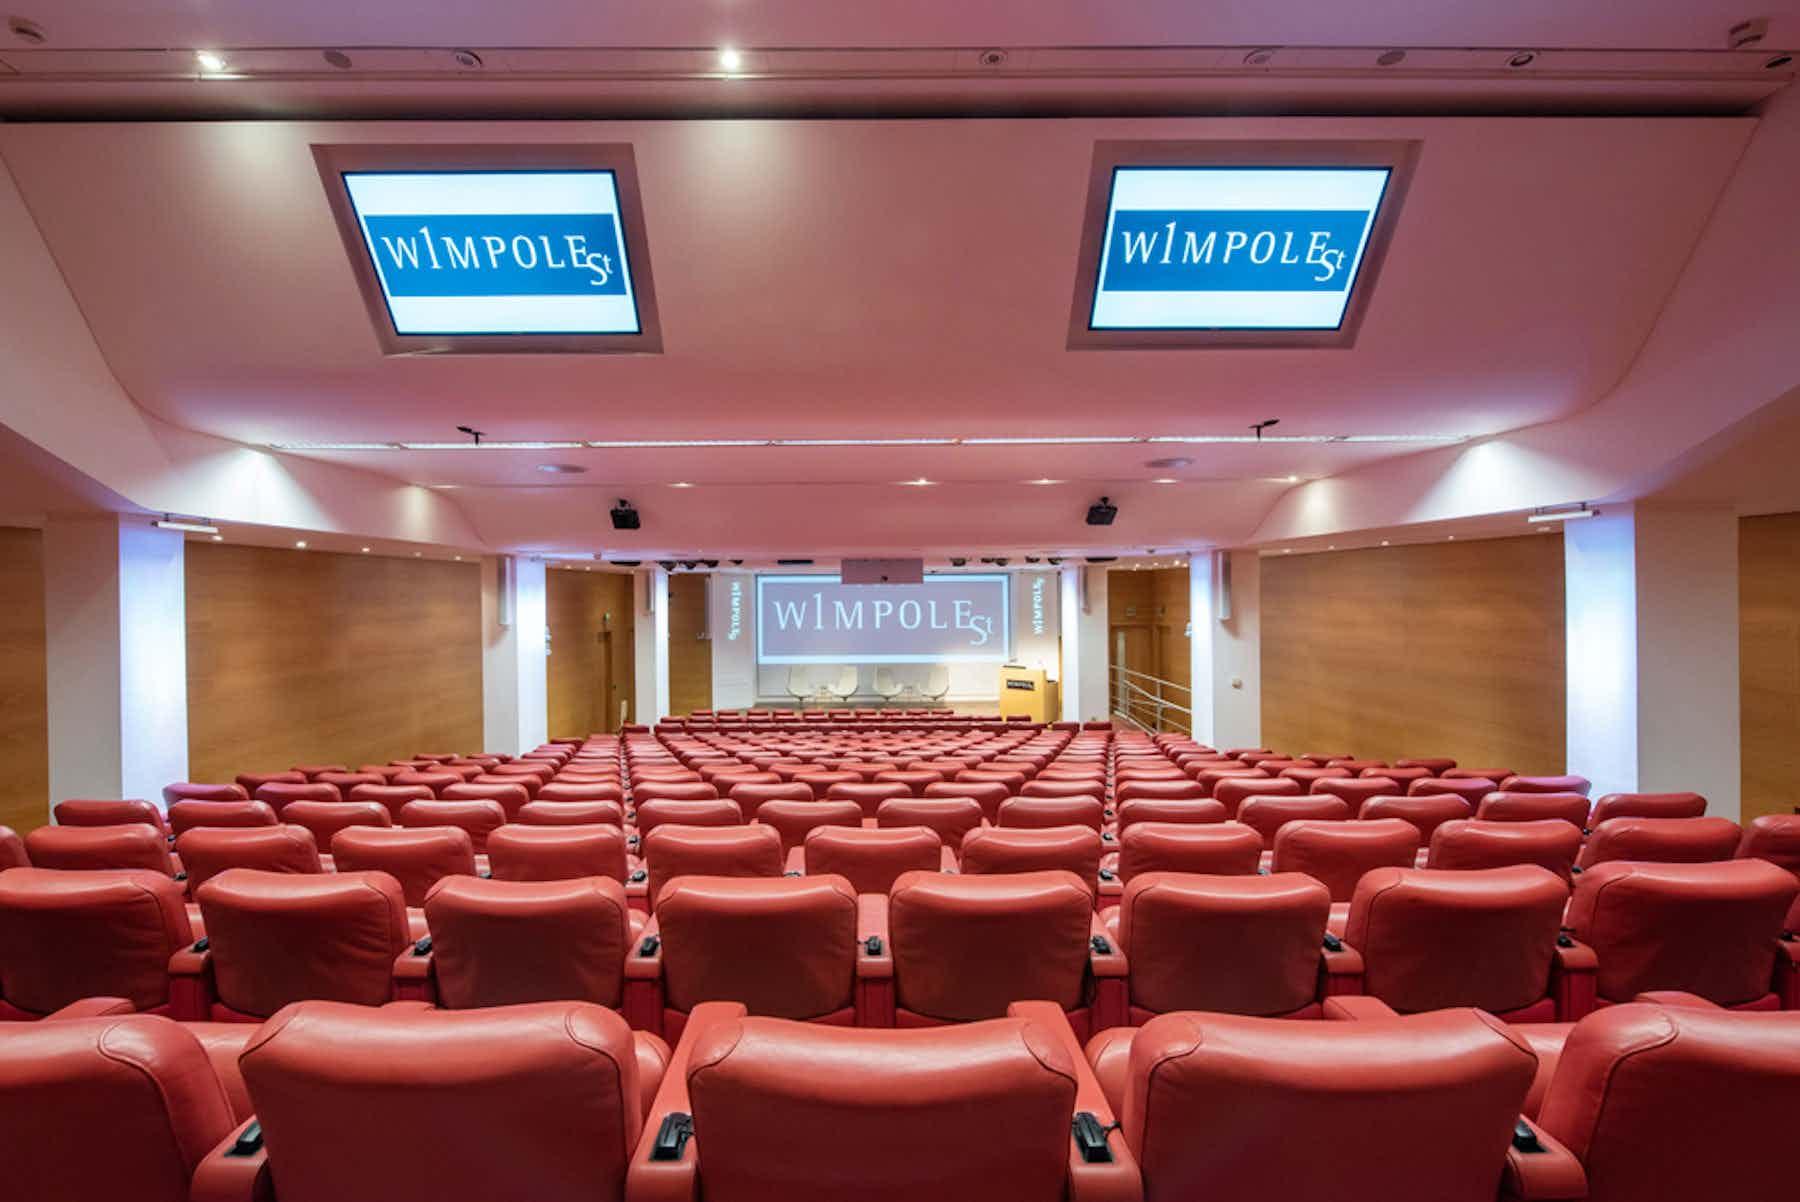 Guy Whittle Auditorium, 1 Wimpole Street